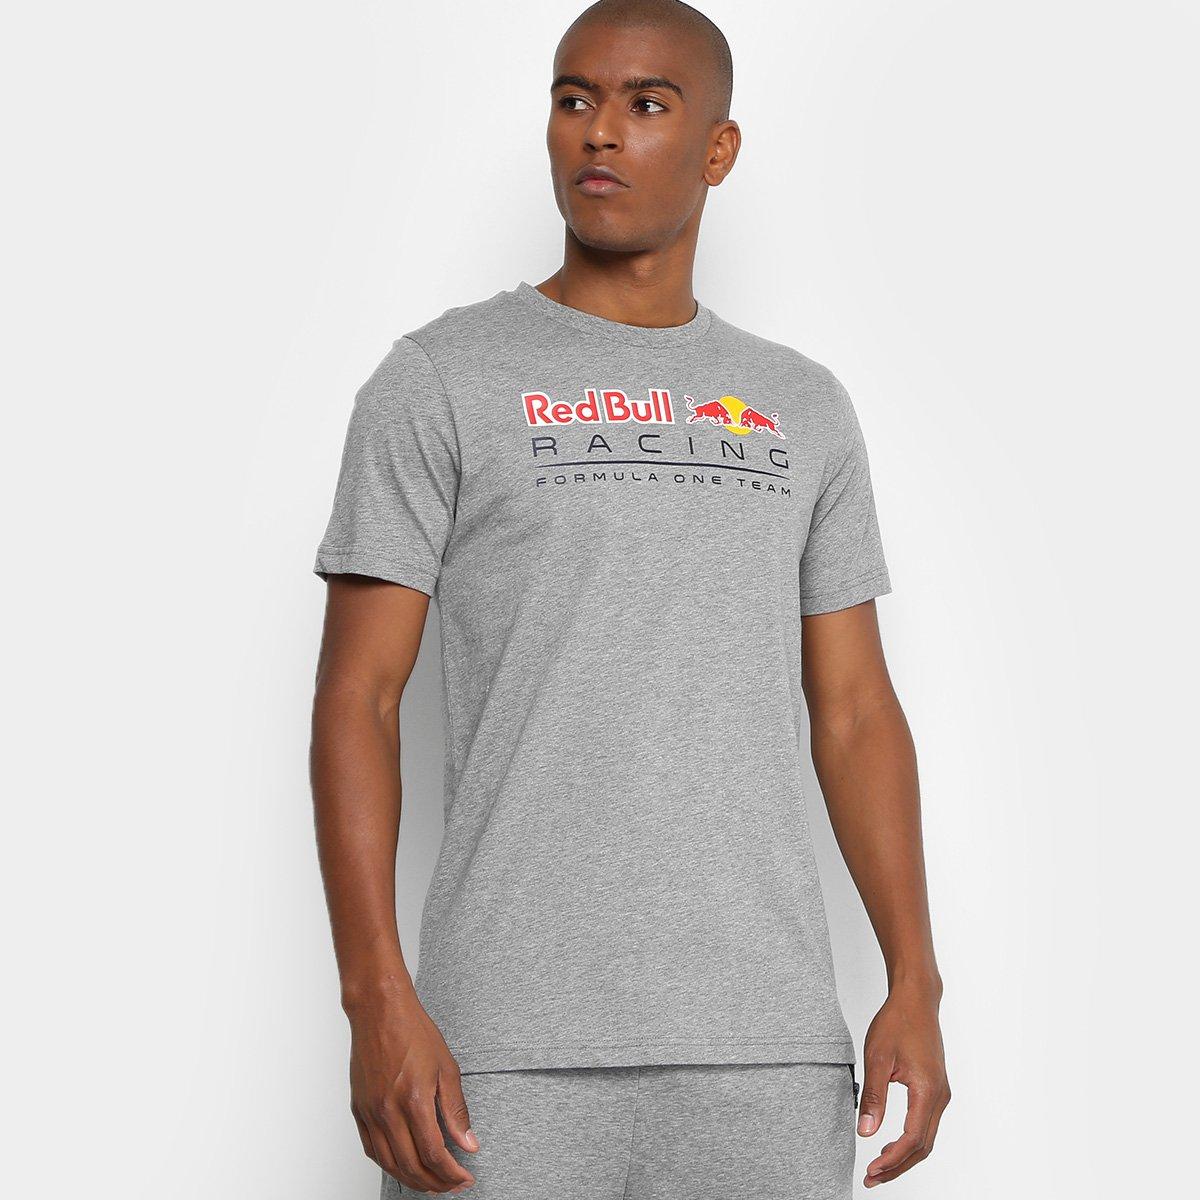 fff062bc825f6 Camiseta Puma Logo Red Bull Racing Masculina - Cinza e Branco - Compre Agora